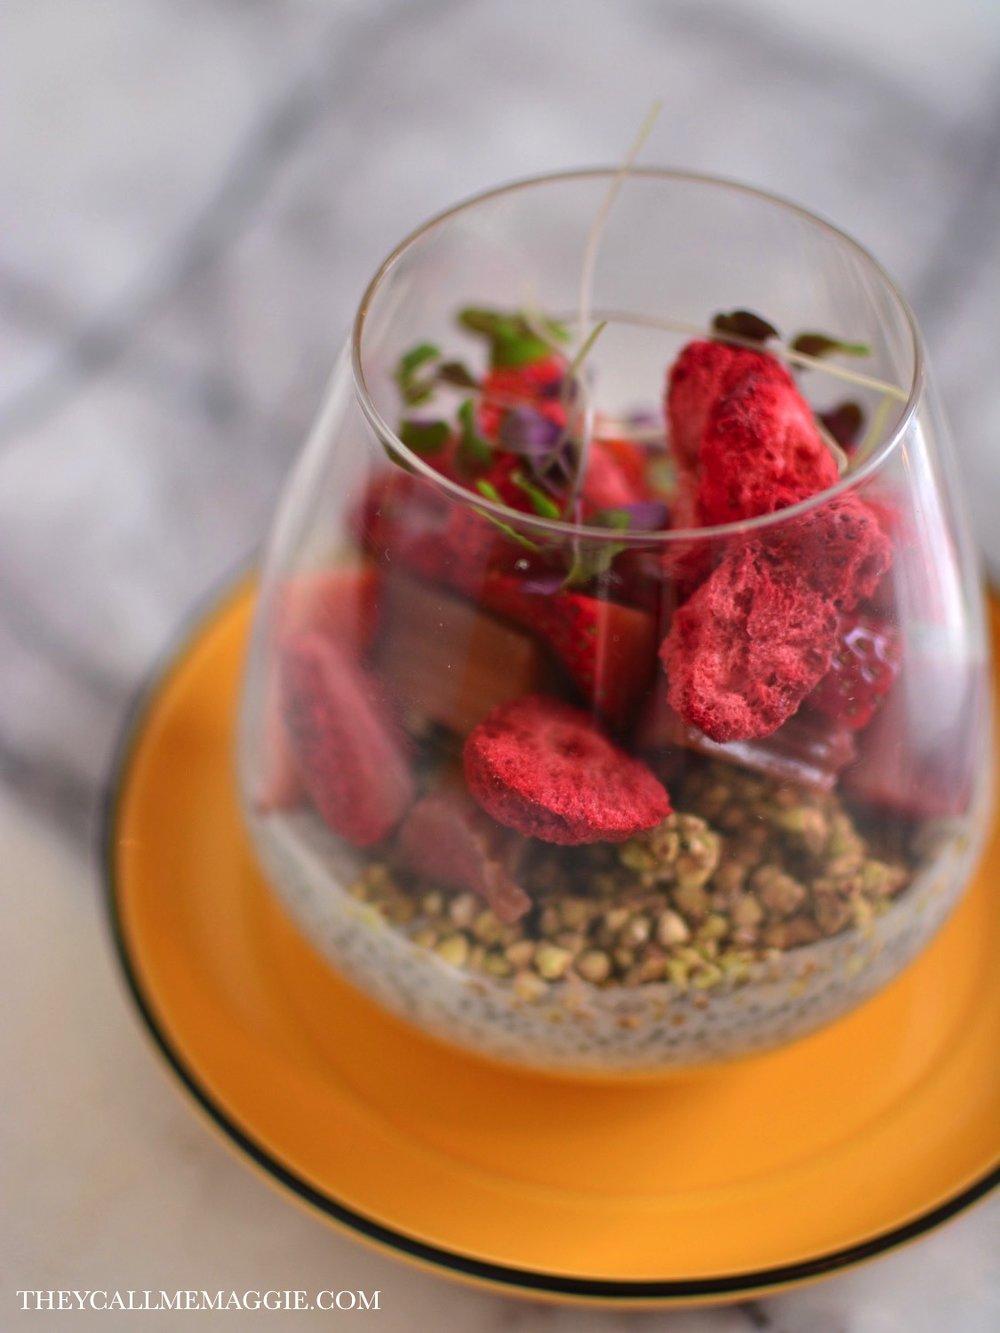 Chia seed pudding - with lemon curd, buckinis, rhubarb and strawberries.